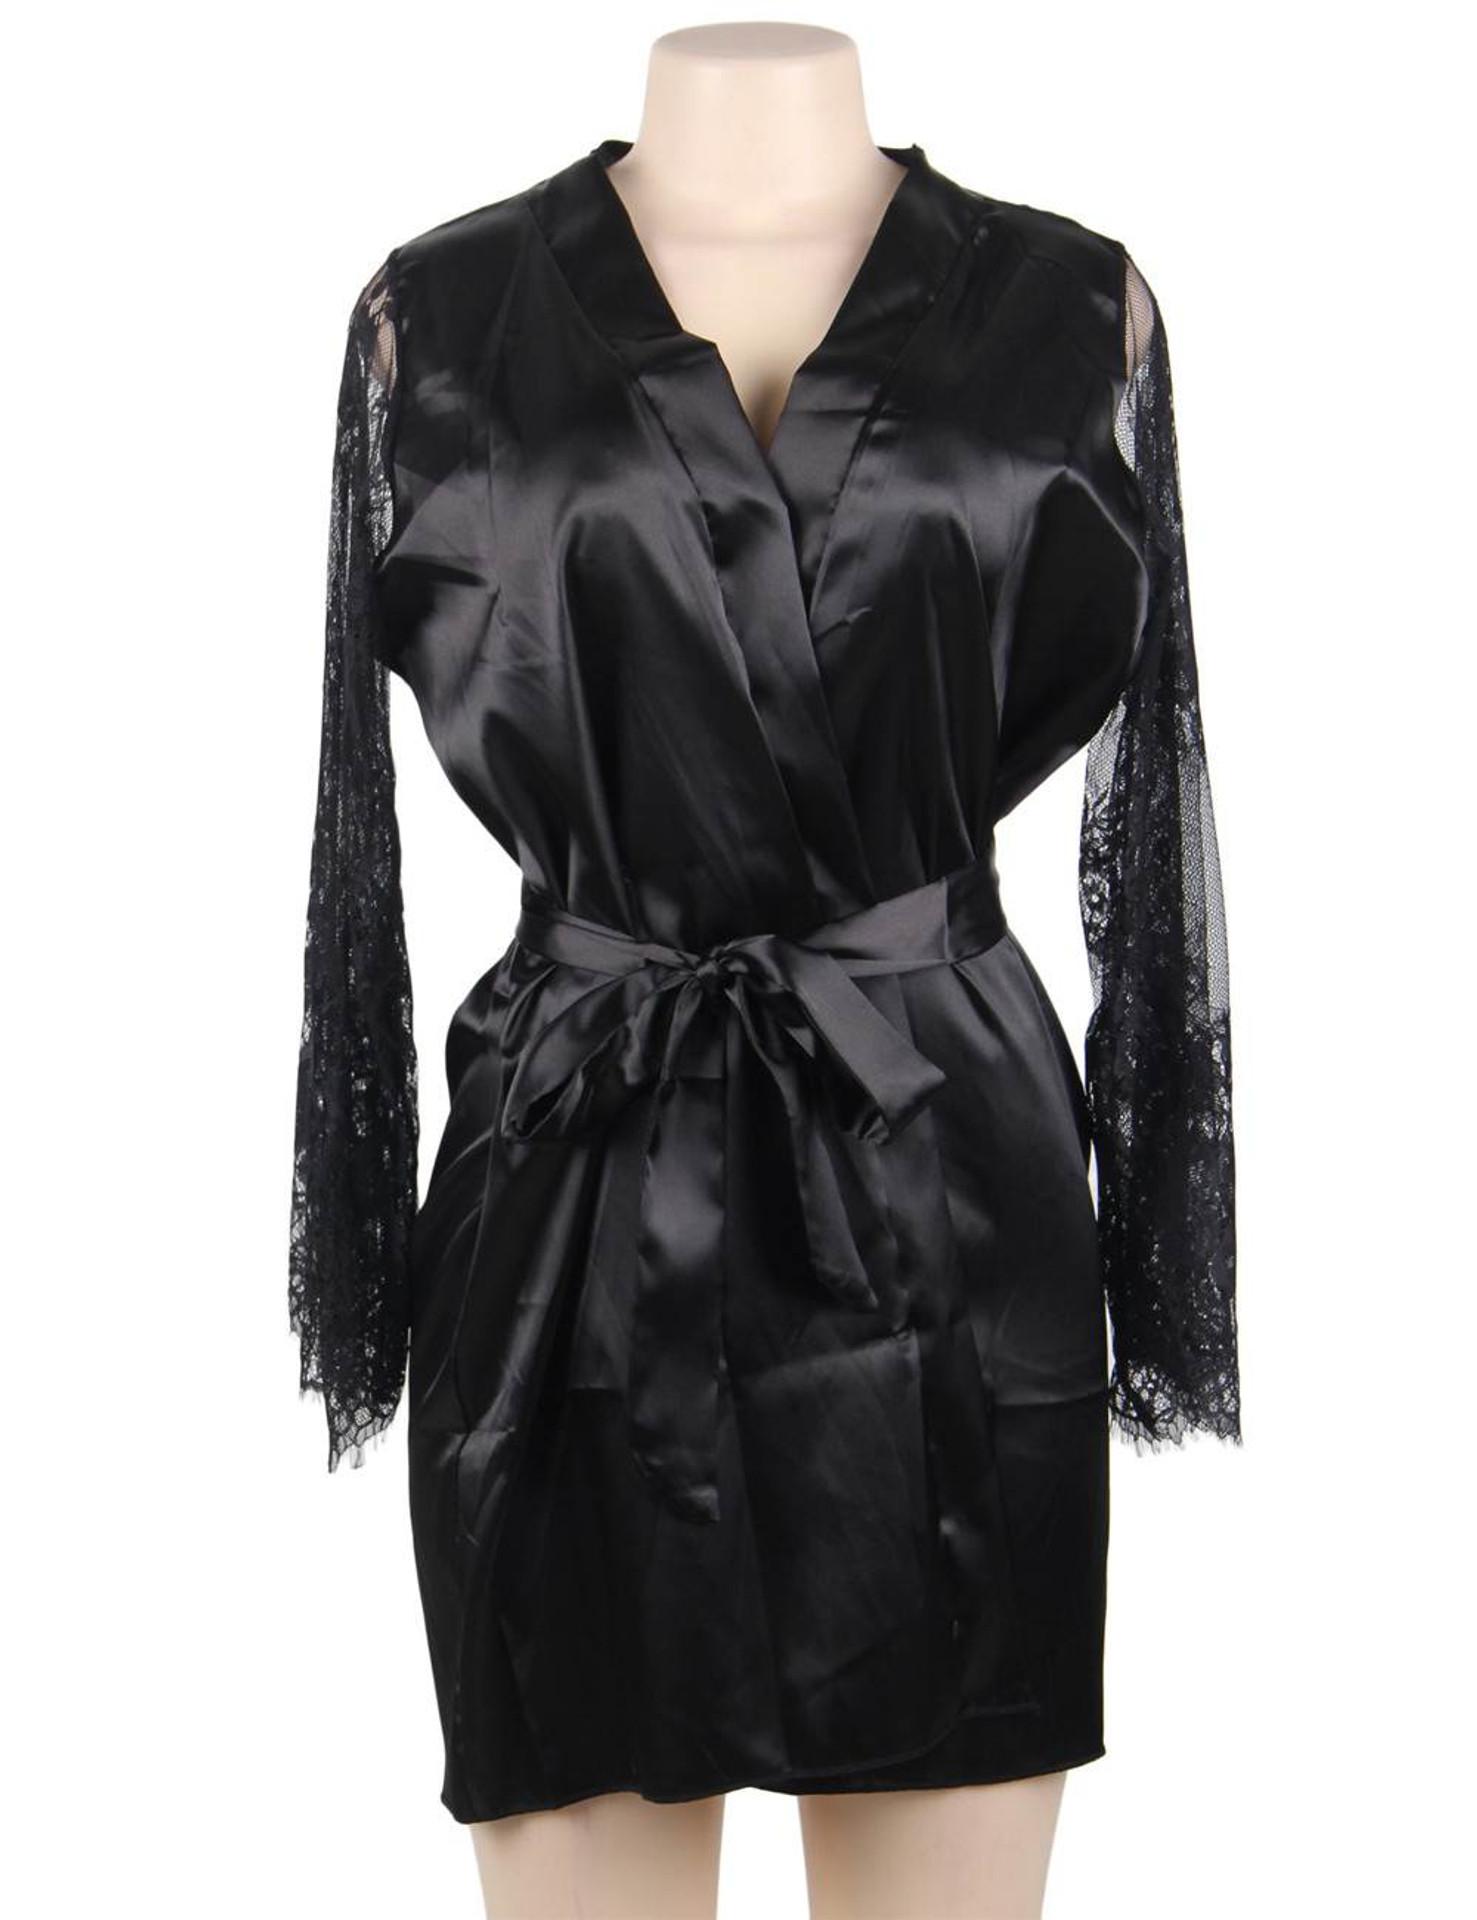 Emy Black Satin Lace Sleeves Robe Set Plus Size